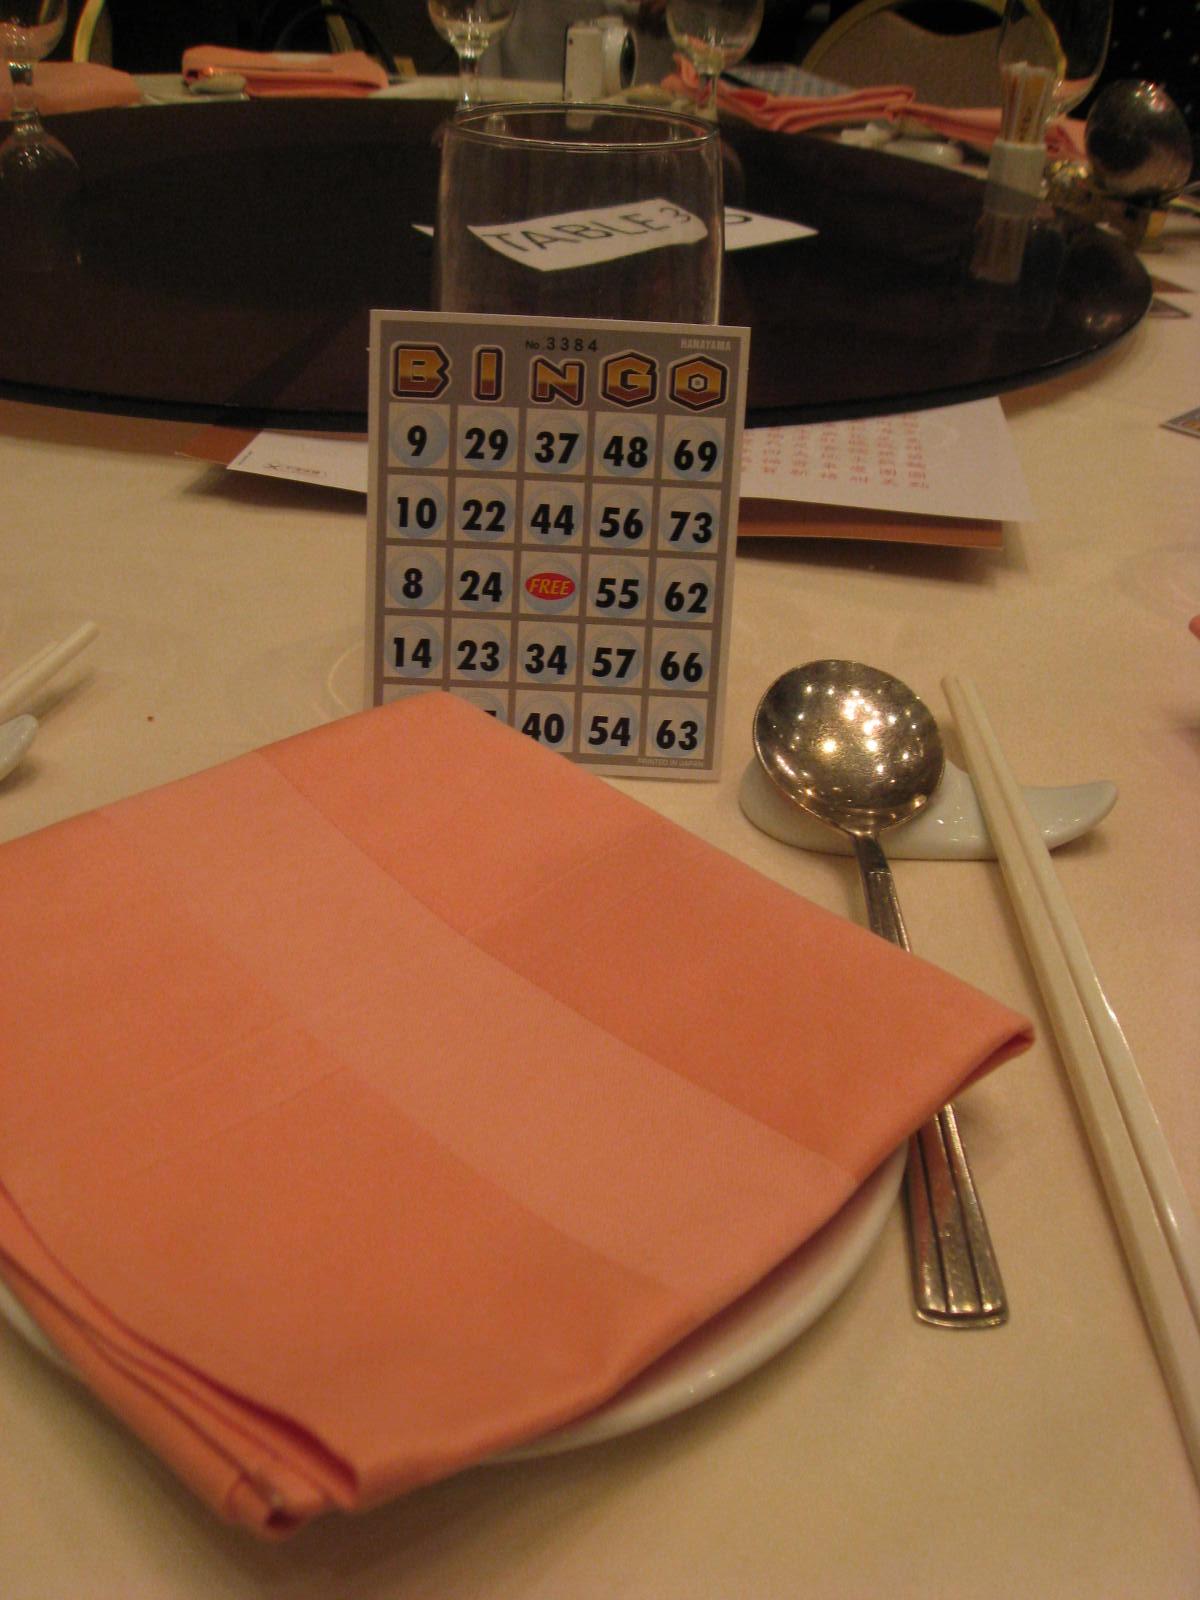 葵芳 – 美心皇宮(maxim's palace chinese restaurant) | meh